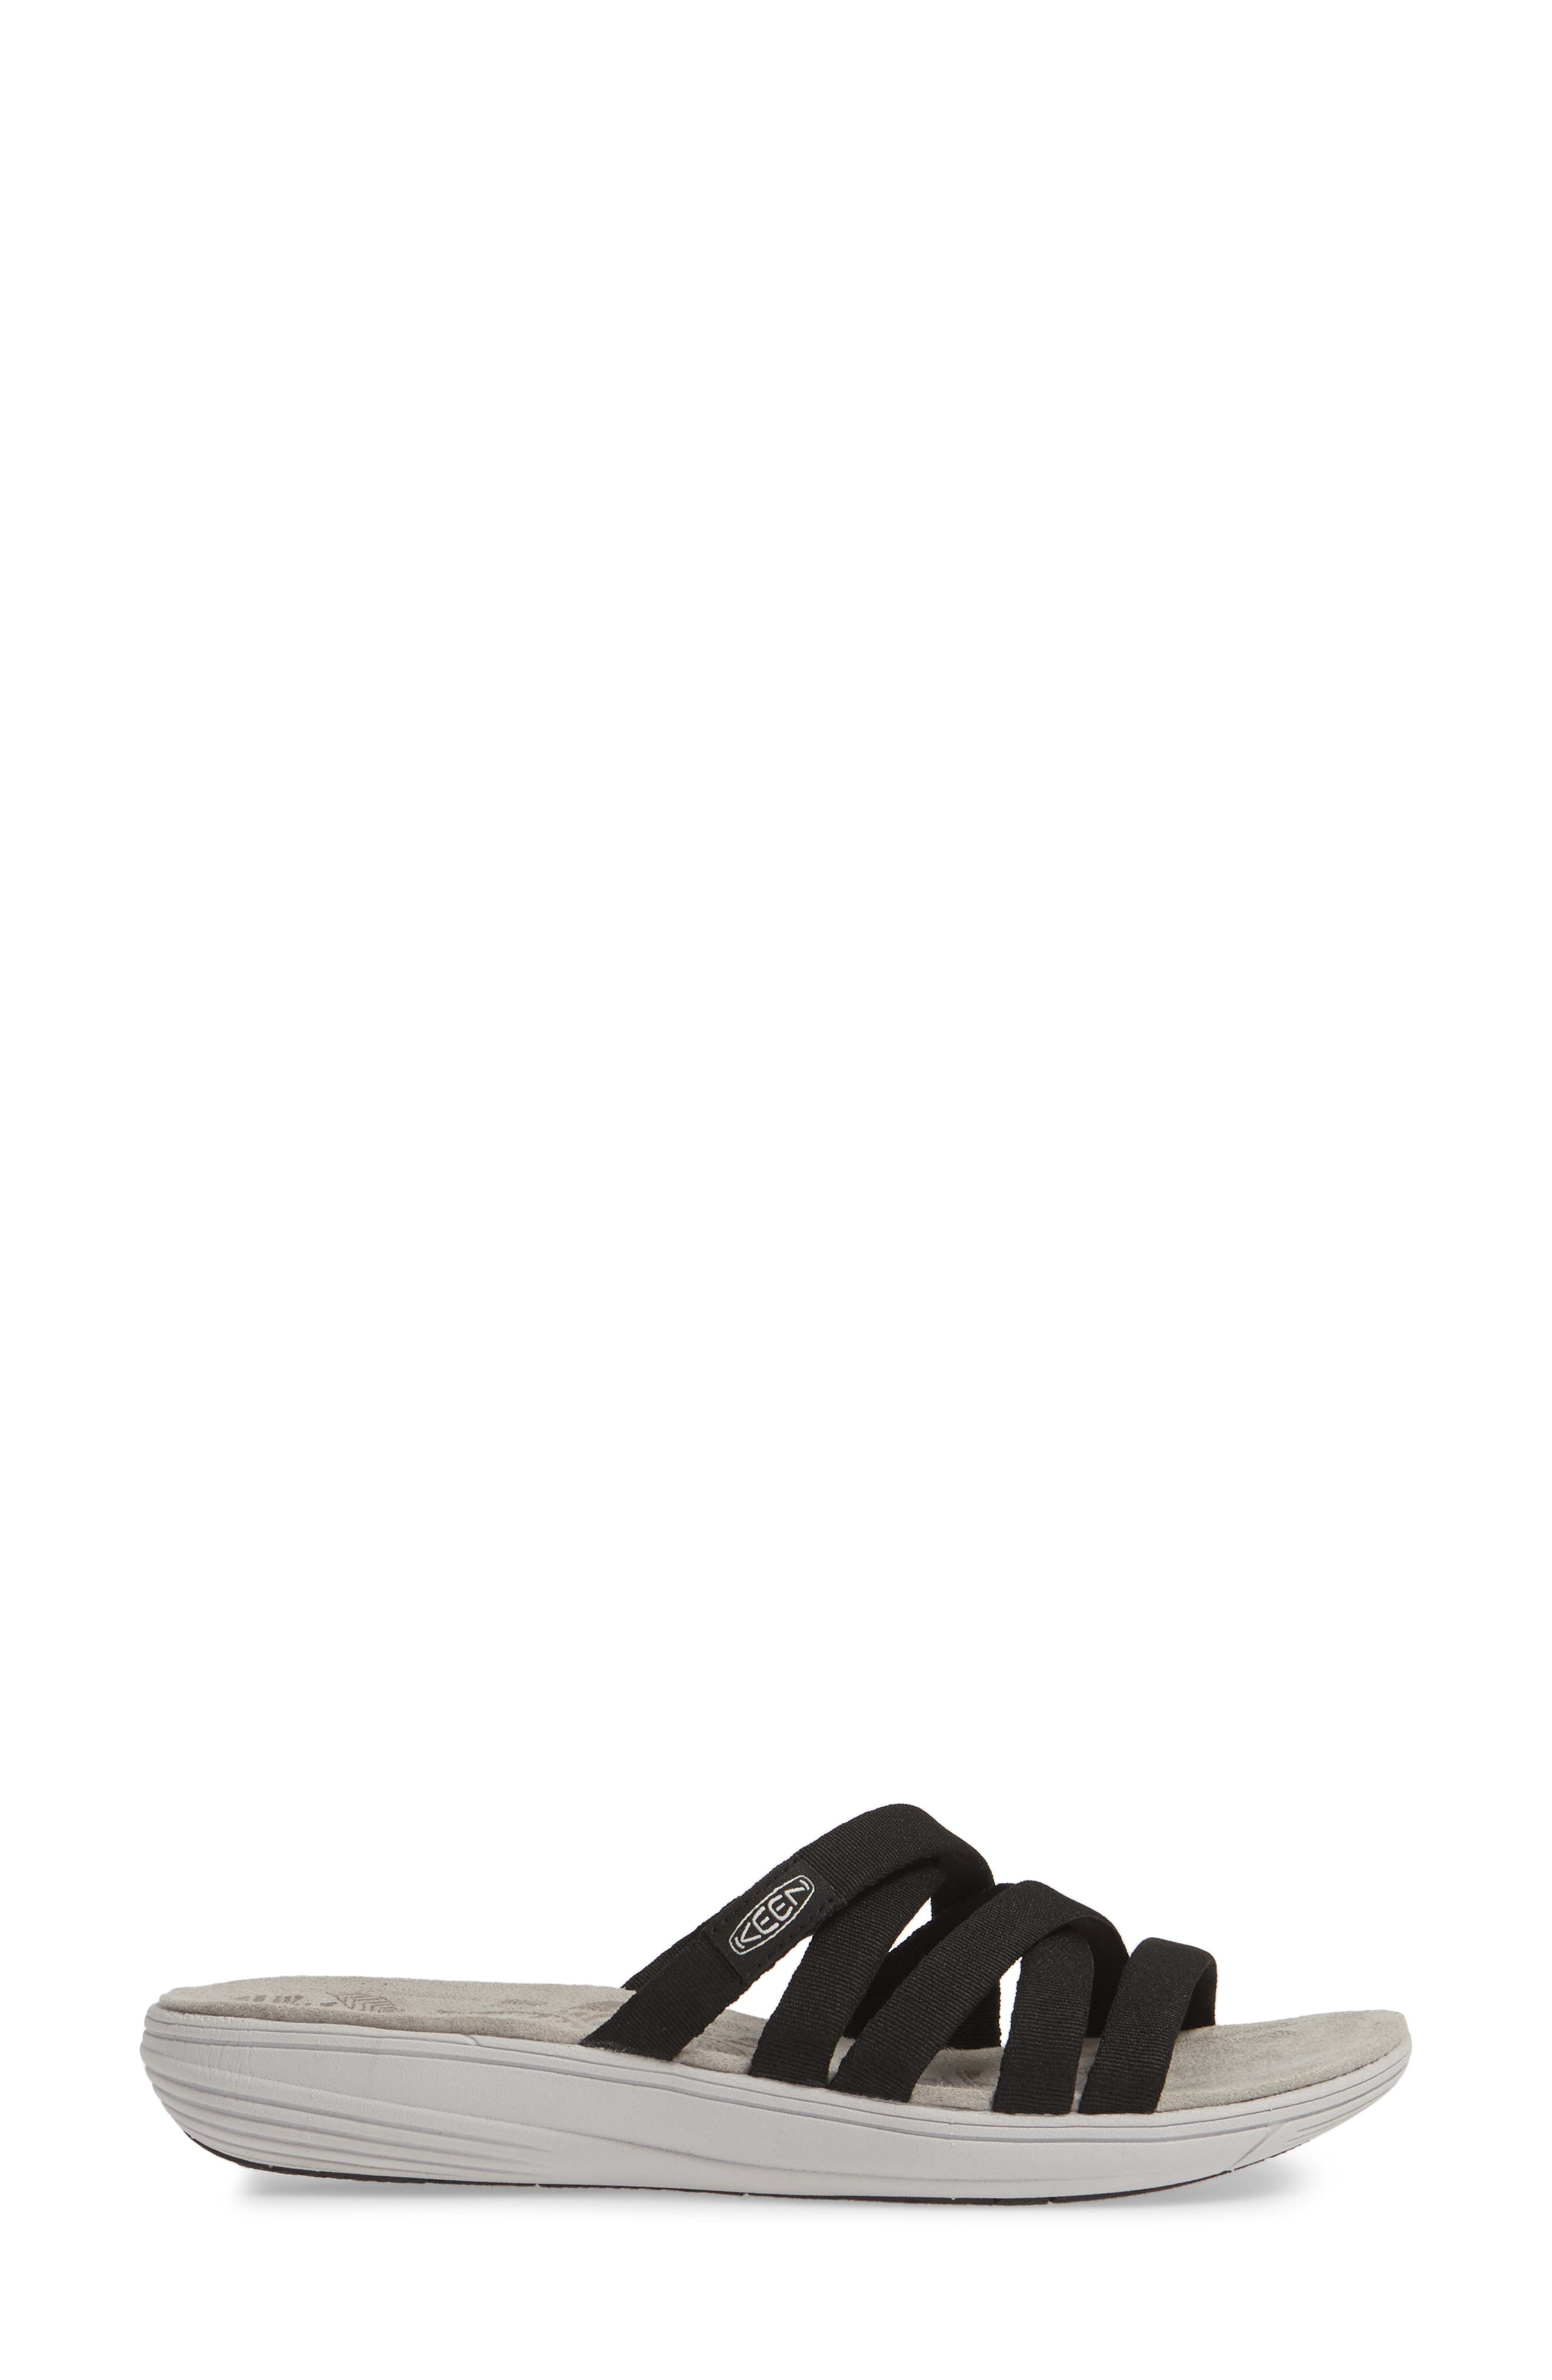 KEEN, Damaya Slide Sandal, Alternate thumbnail 3, color, BLACK/ VAPOR BLUE FABRIC